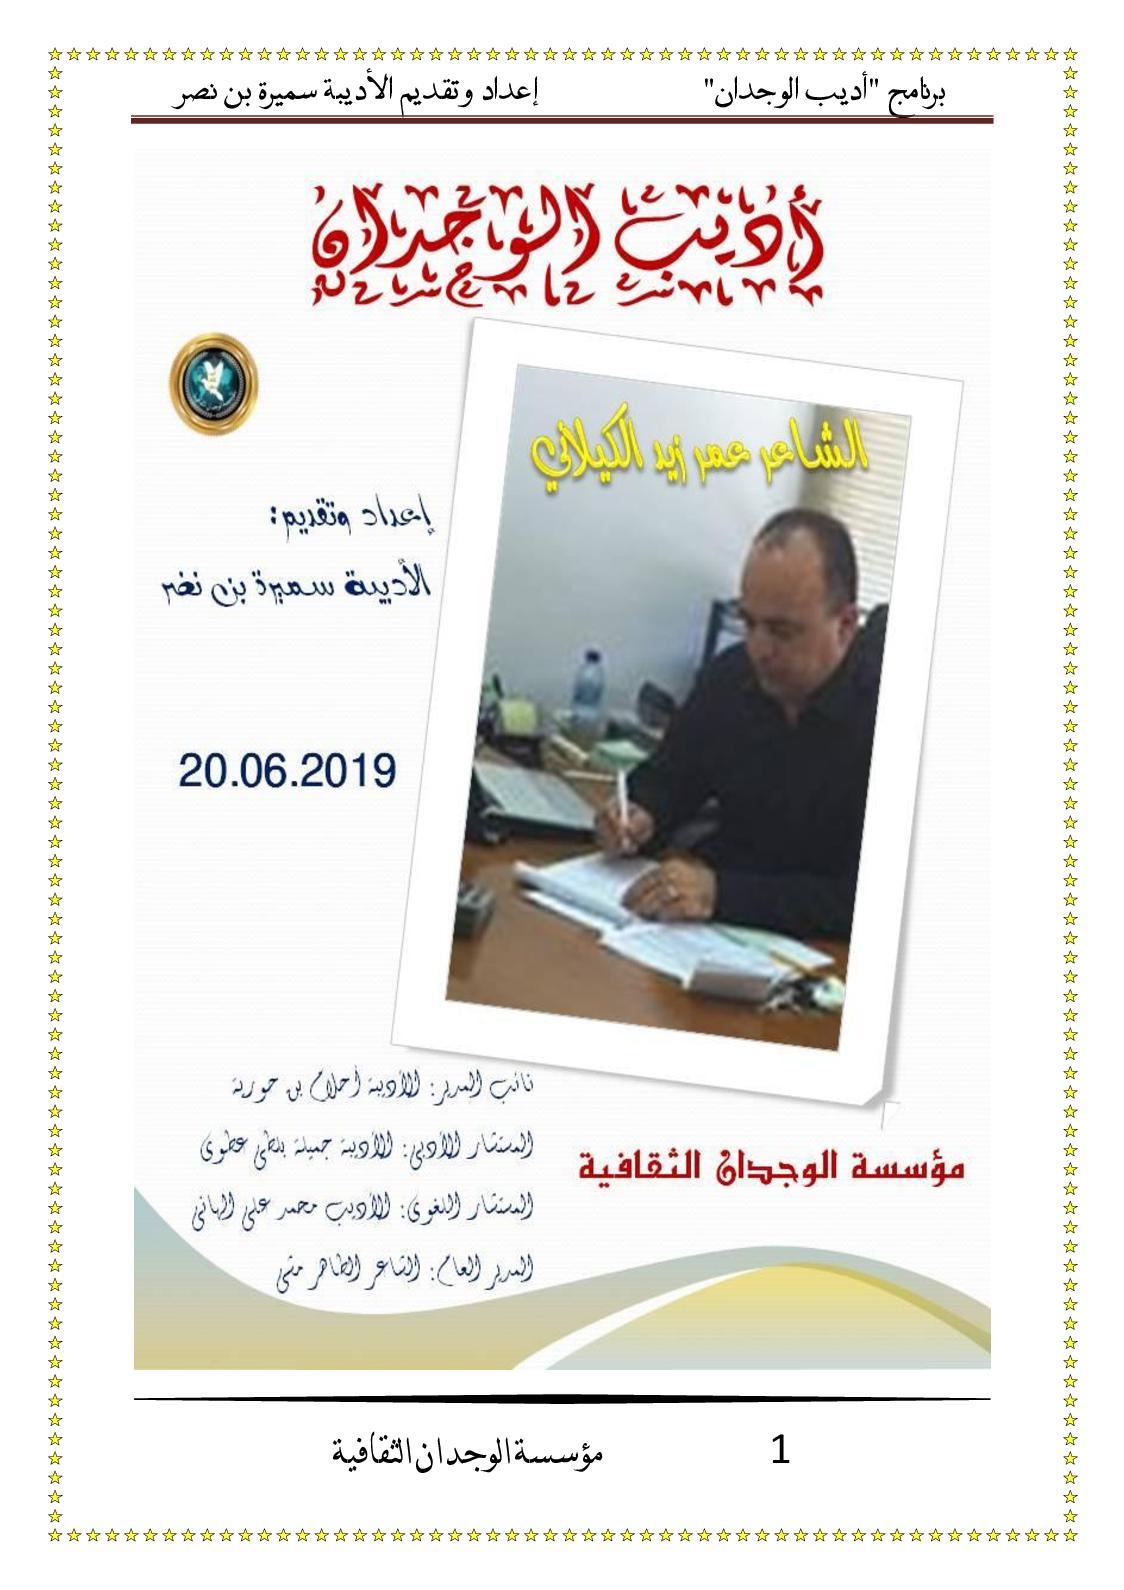 Calaméo أديب الوجدان الشاعر عمر زيد الكيلاني 20 06 2019